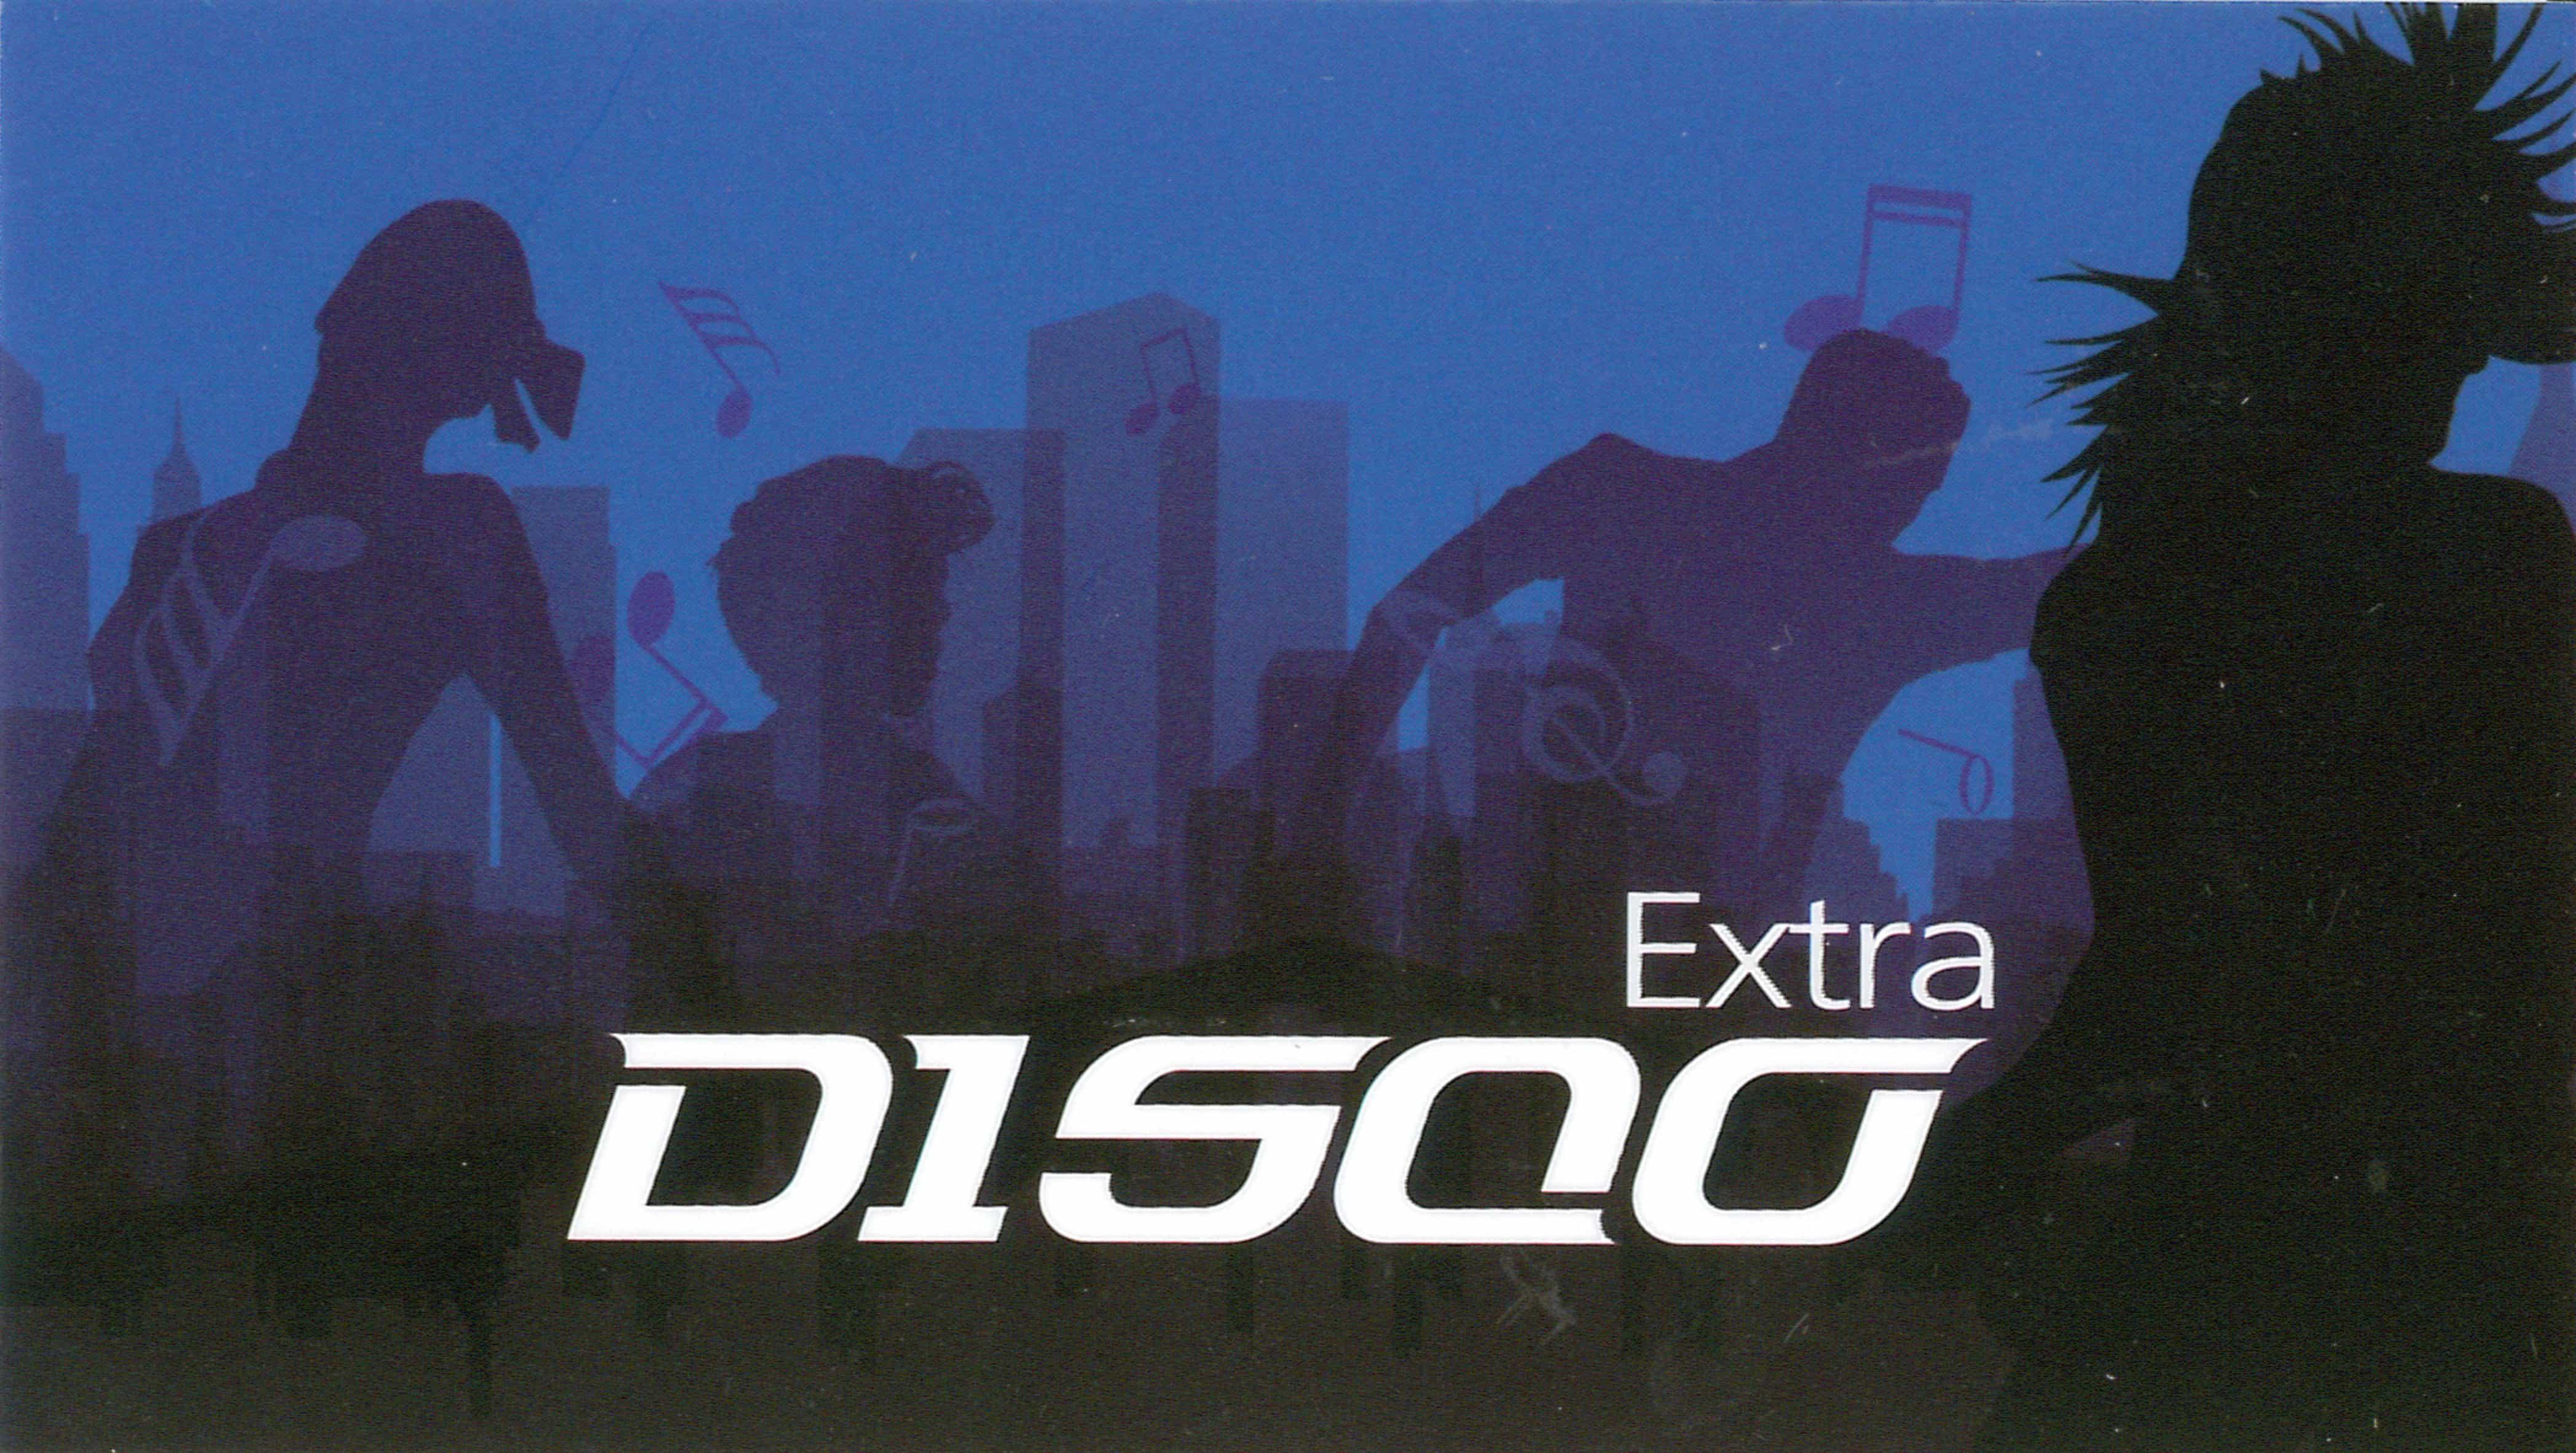 DISCO EXTRA